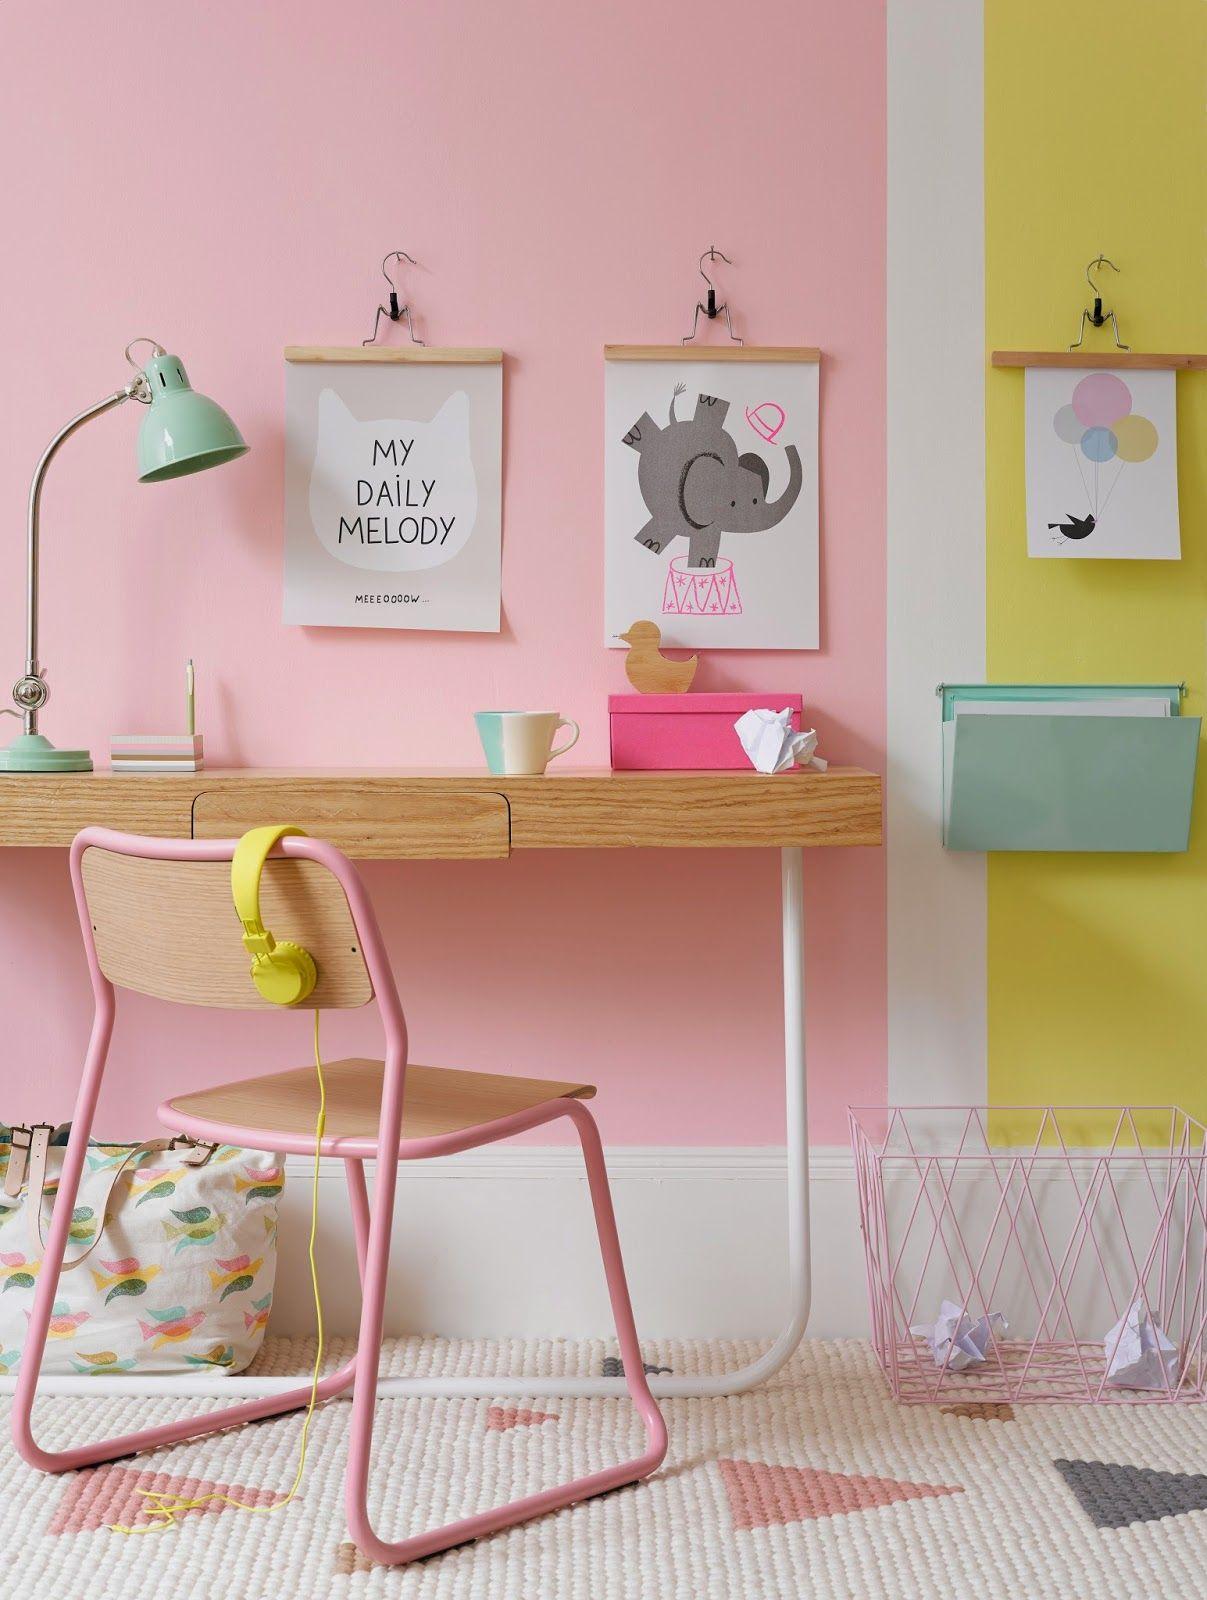 Kinderzimmer wanddekor good homes september charlotte love  build a nice home